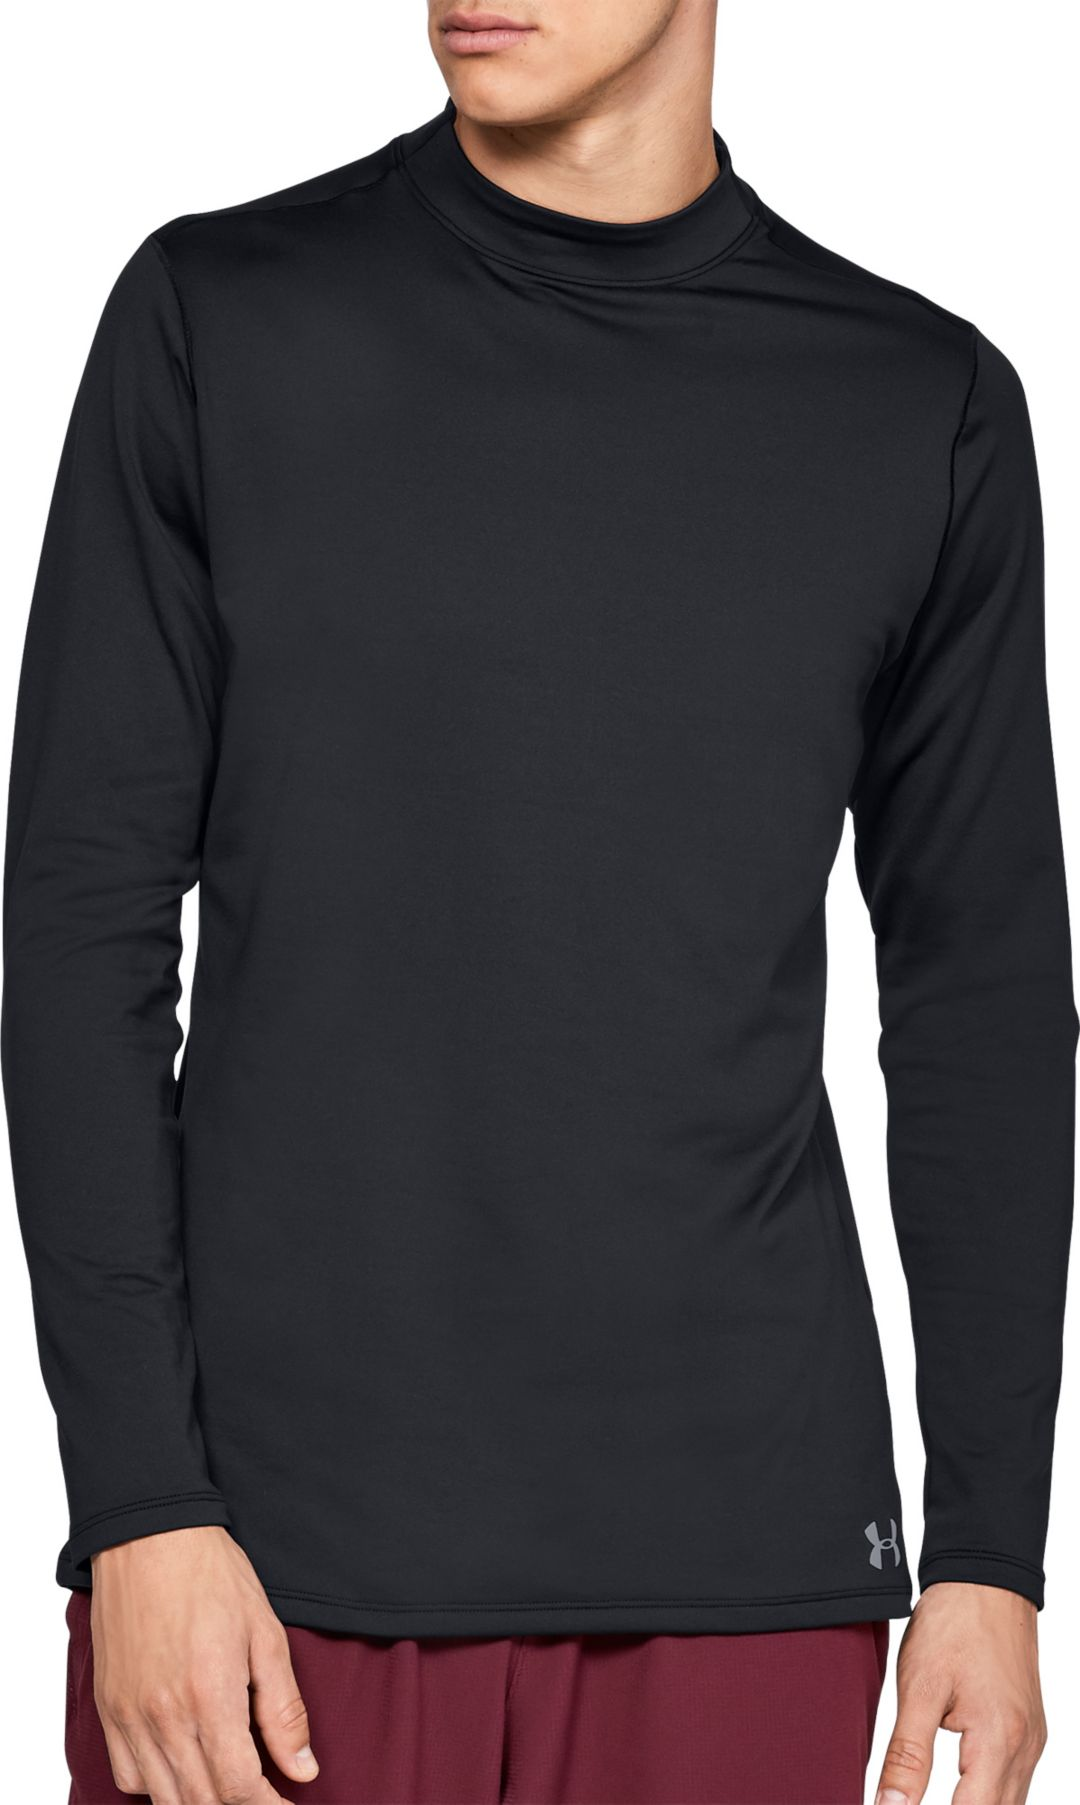 719d3473c Under Armour Men's ColdGear Armour Mock Neck Long Sleeve Shirt.  noImageFound. Previous